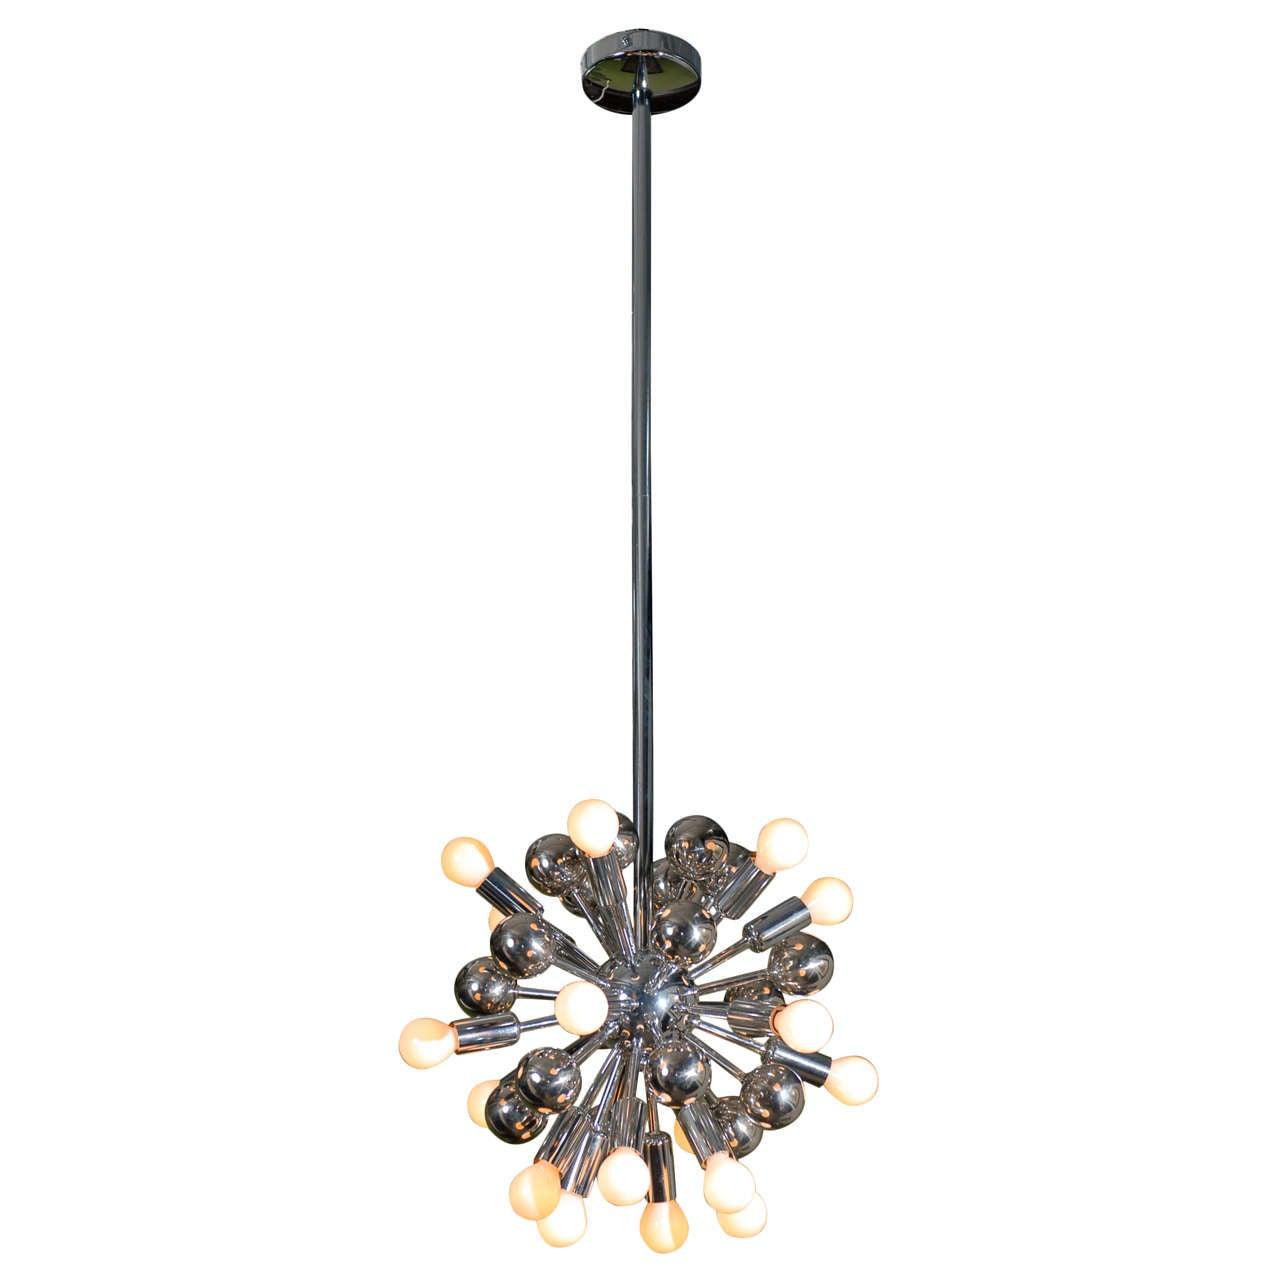 Chrome italian sputnik chandelier at 1stdibs for Sputnik chandelier